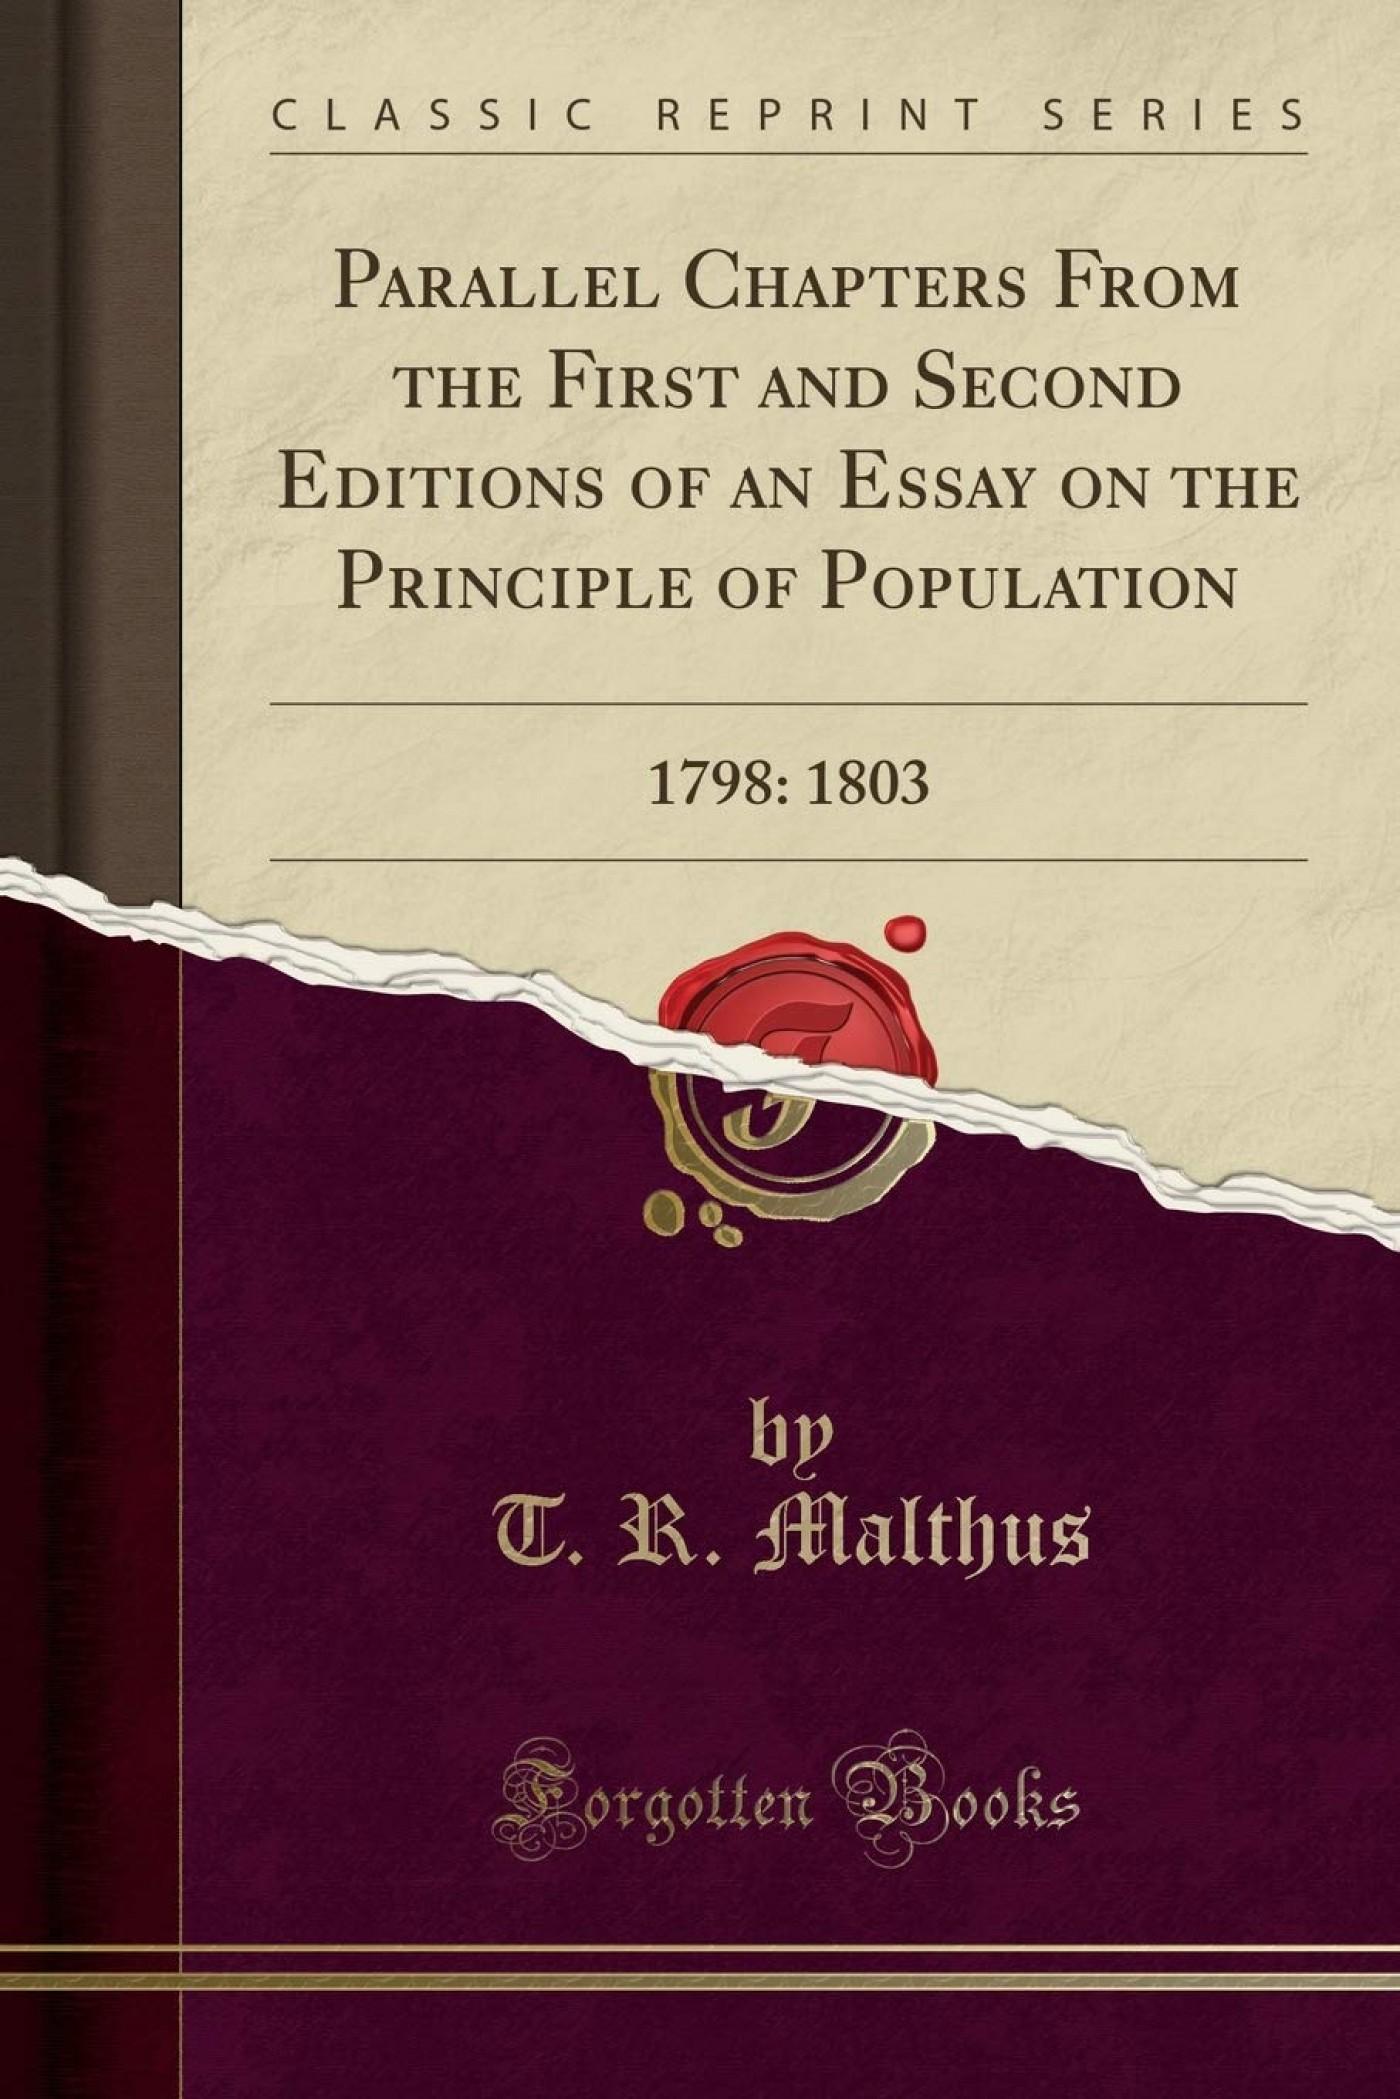 017 61xy24cllwl Essay On The Principle Of Population Singular Malthus Sparknotes Thomas Main Idea 1400